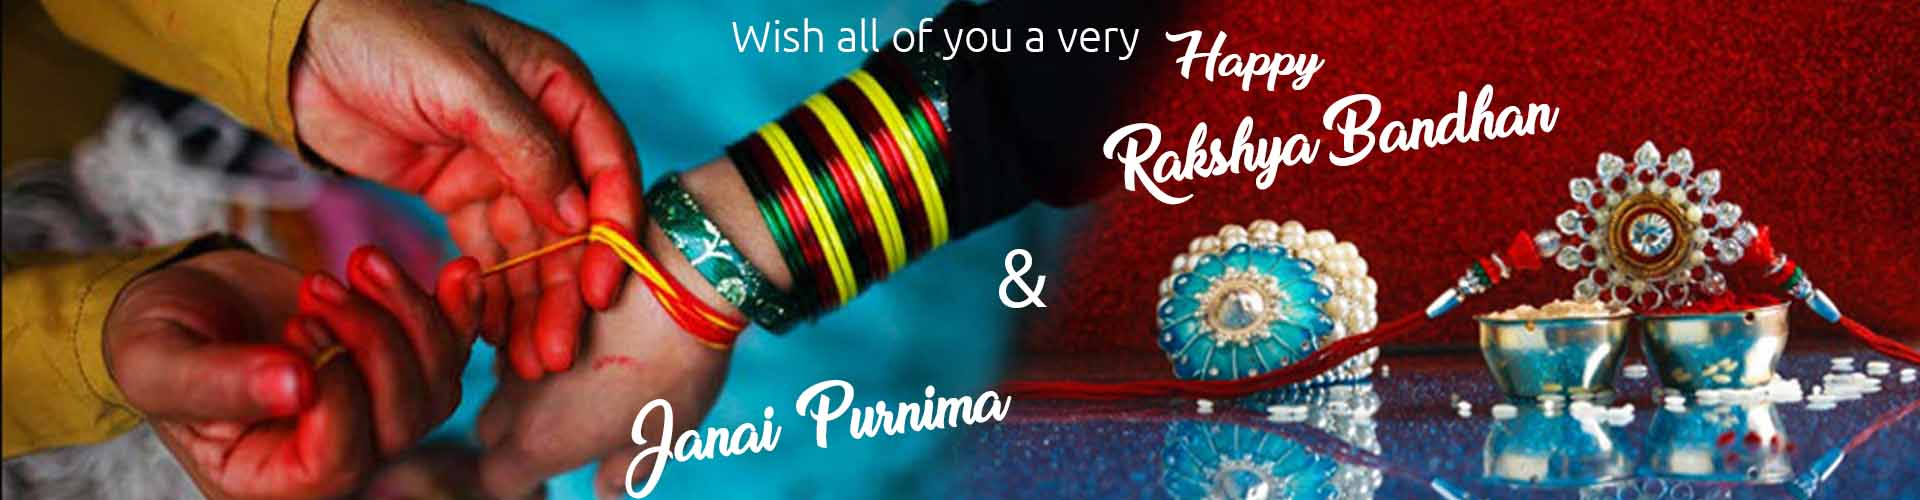 Raksha Bandhan   Janai Purnima   Gift for brother and sister    Holy Festivals of Nepal